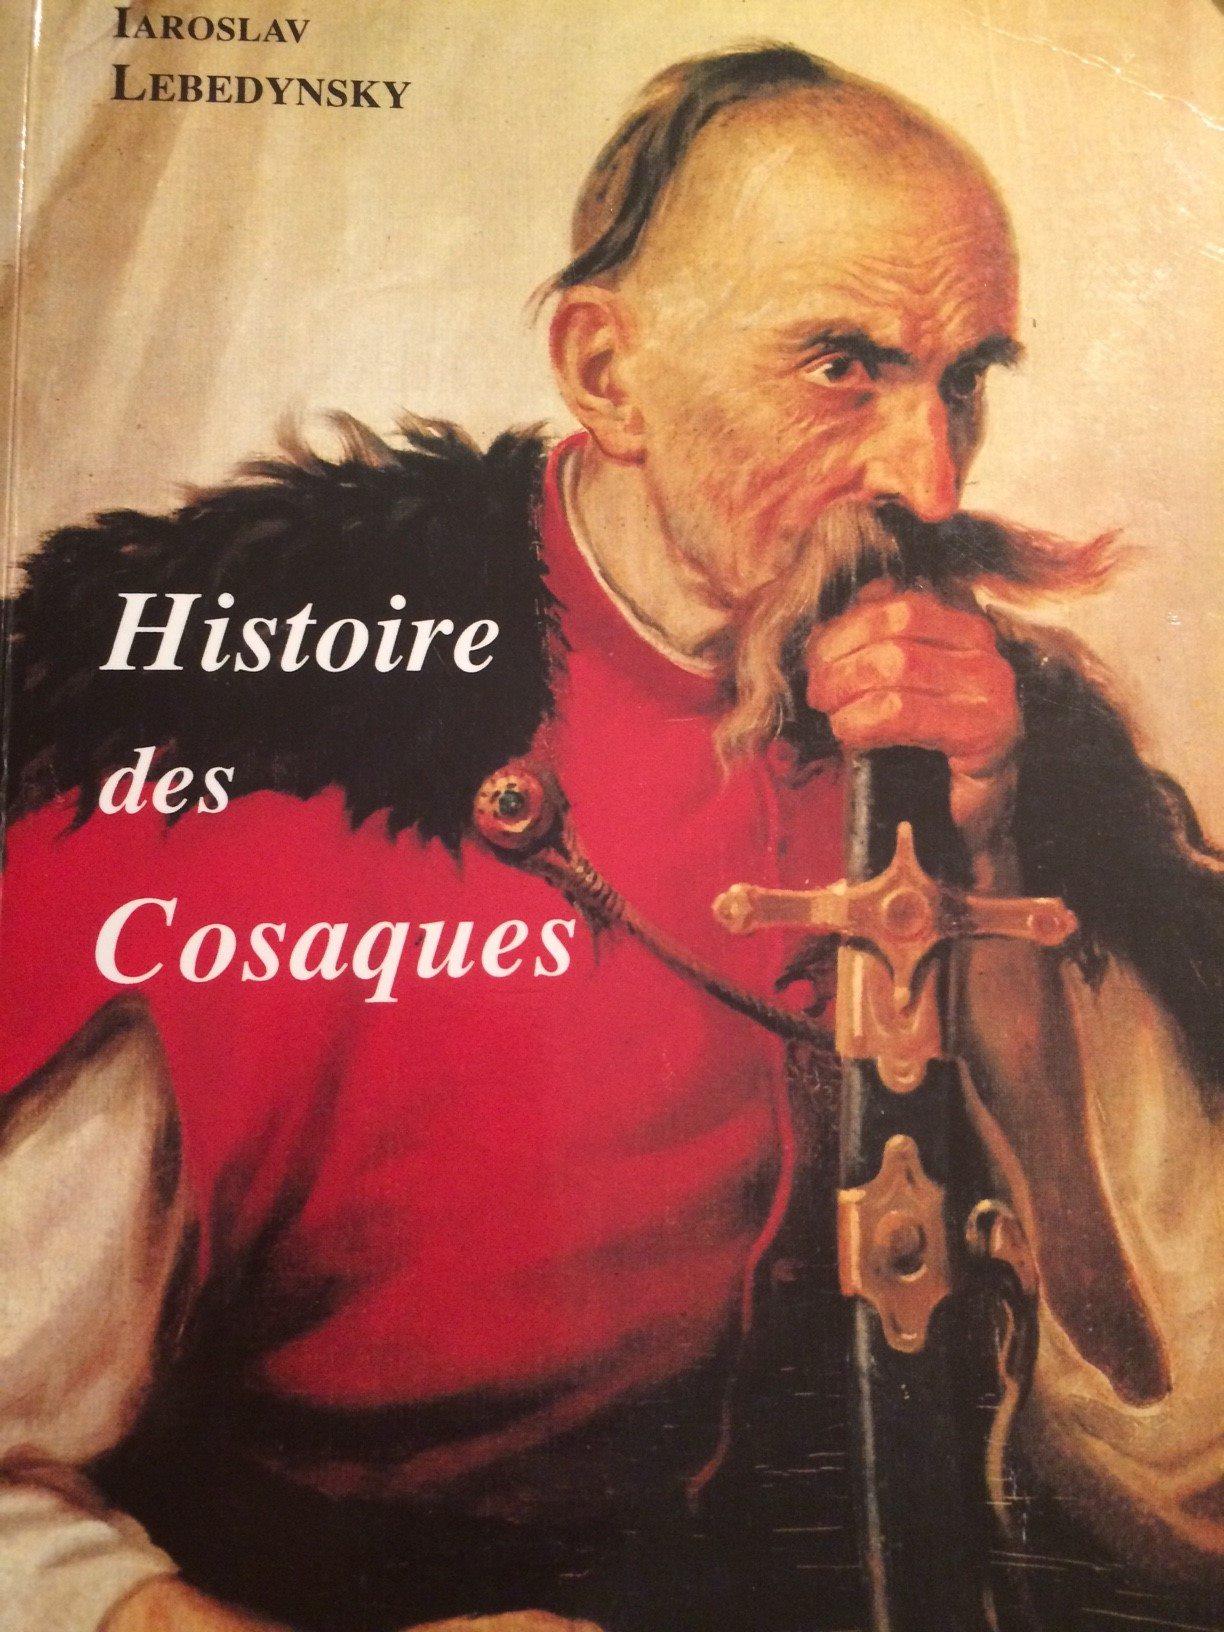 Yaroslav Lebedynsky – Histoire des Cossaks